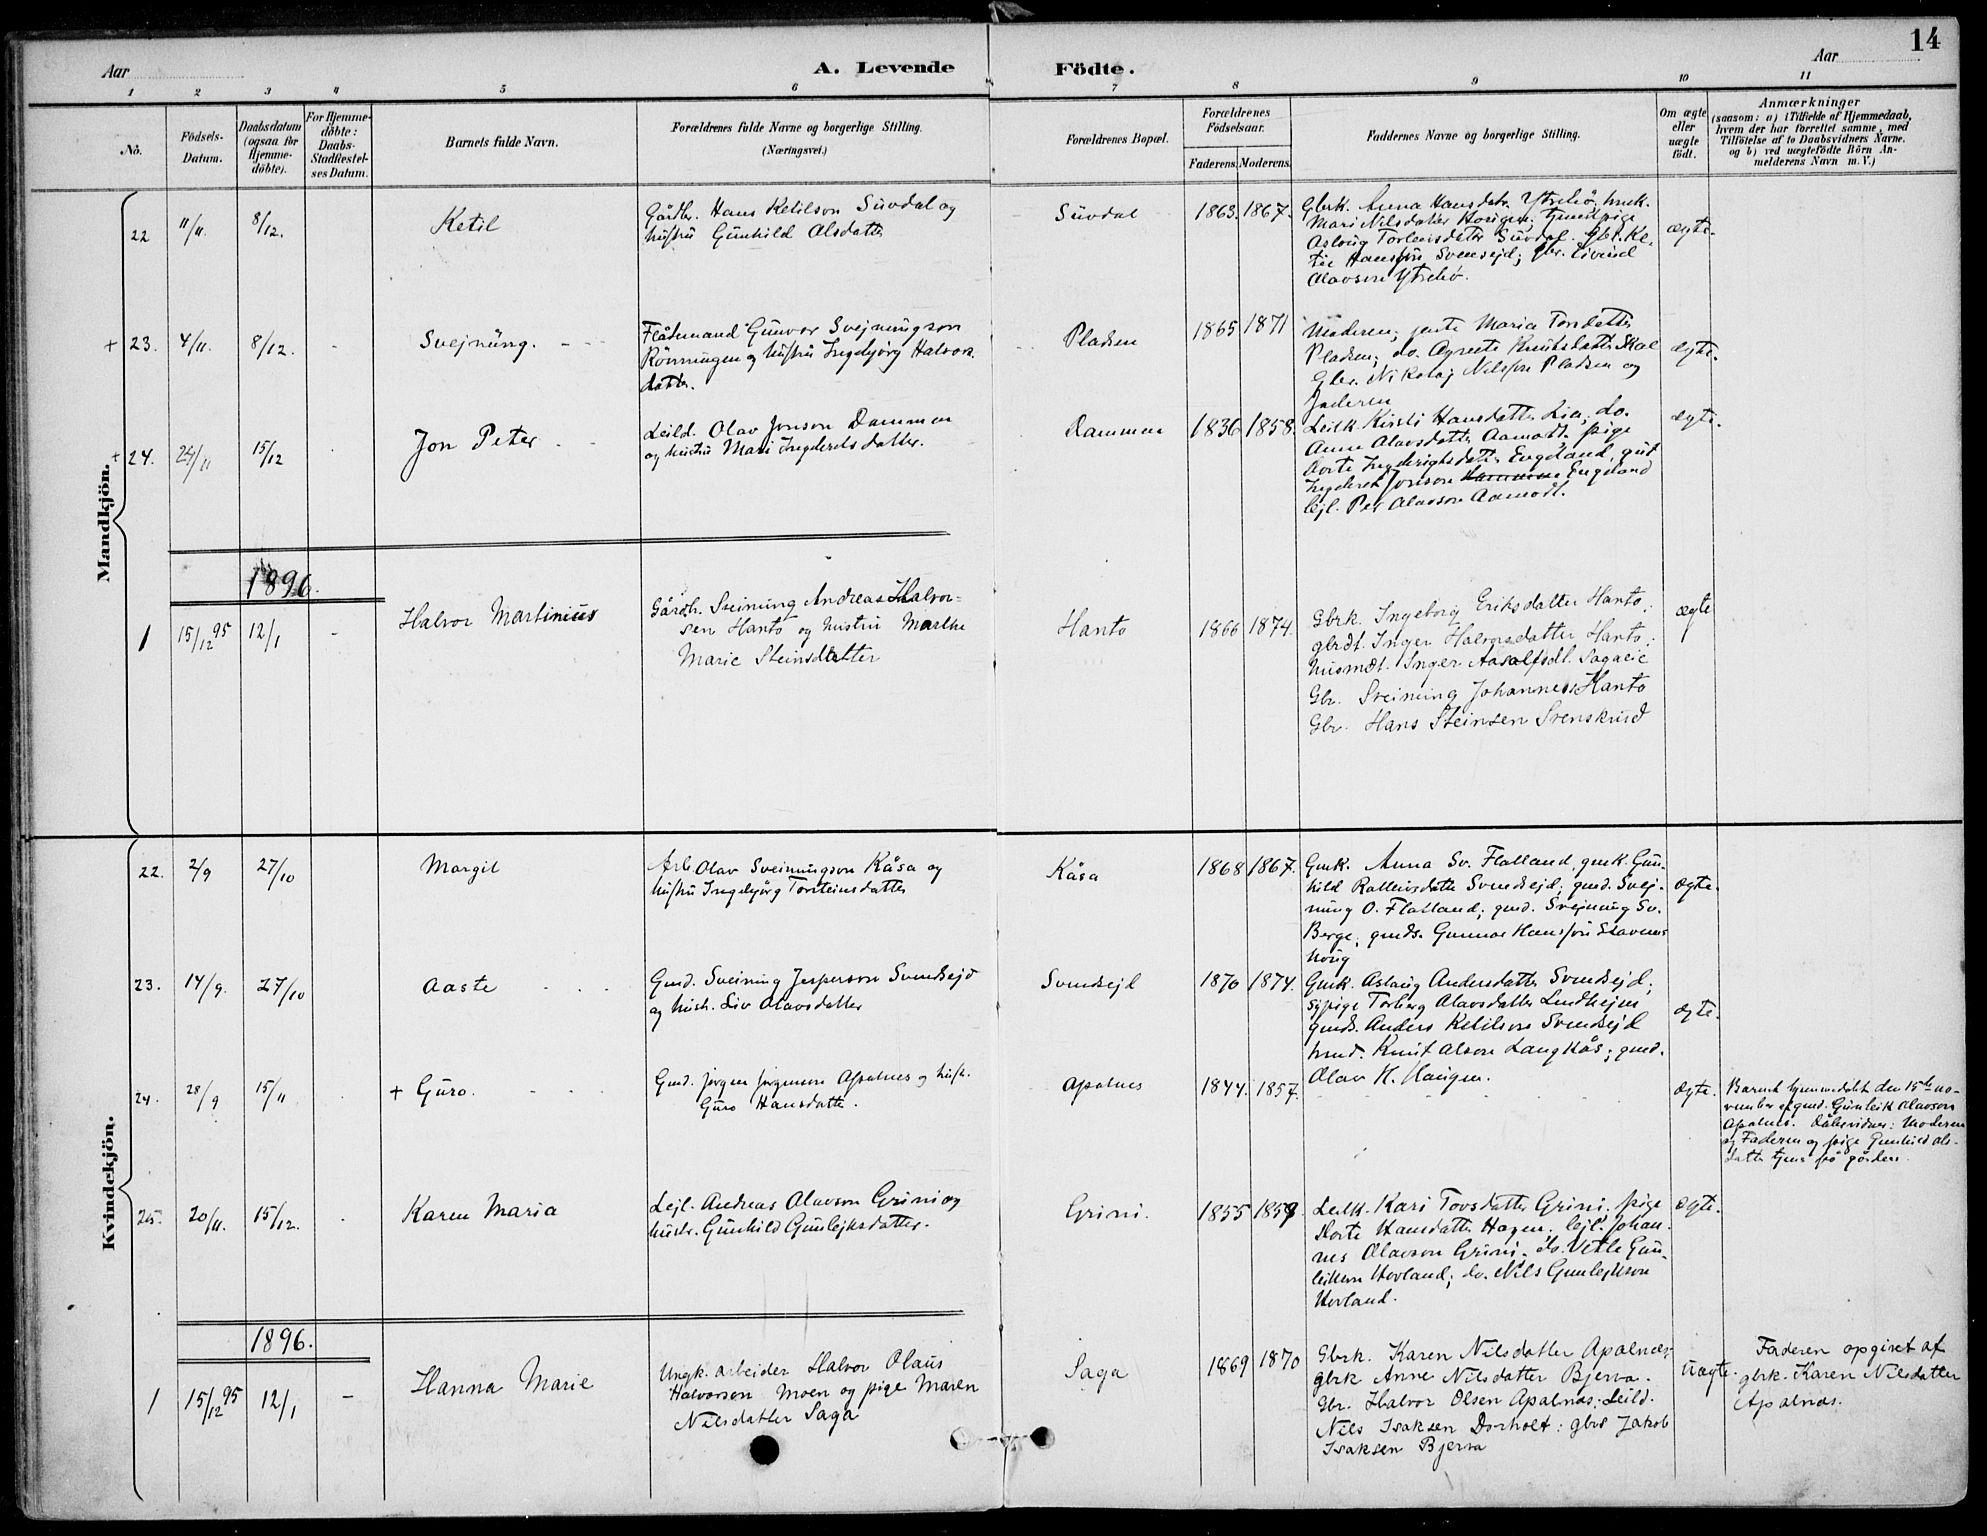 SAKO, Lunde kirkebøker, F/Fa/L0003: Ministerialbok nr. I 3, 1893-1902, s. 14